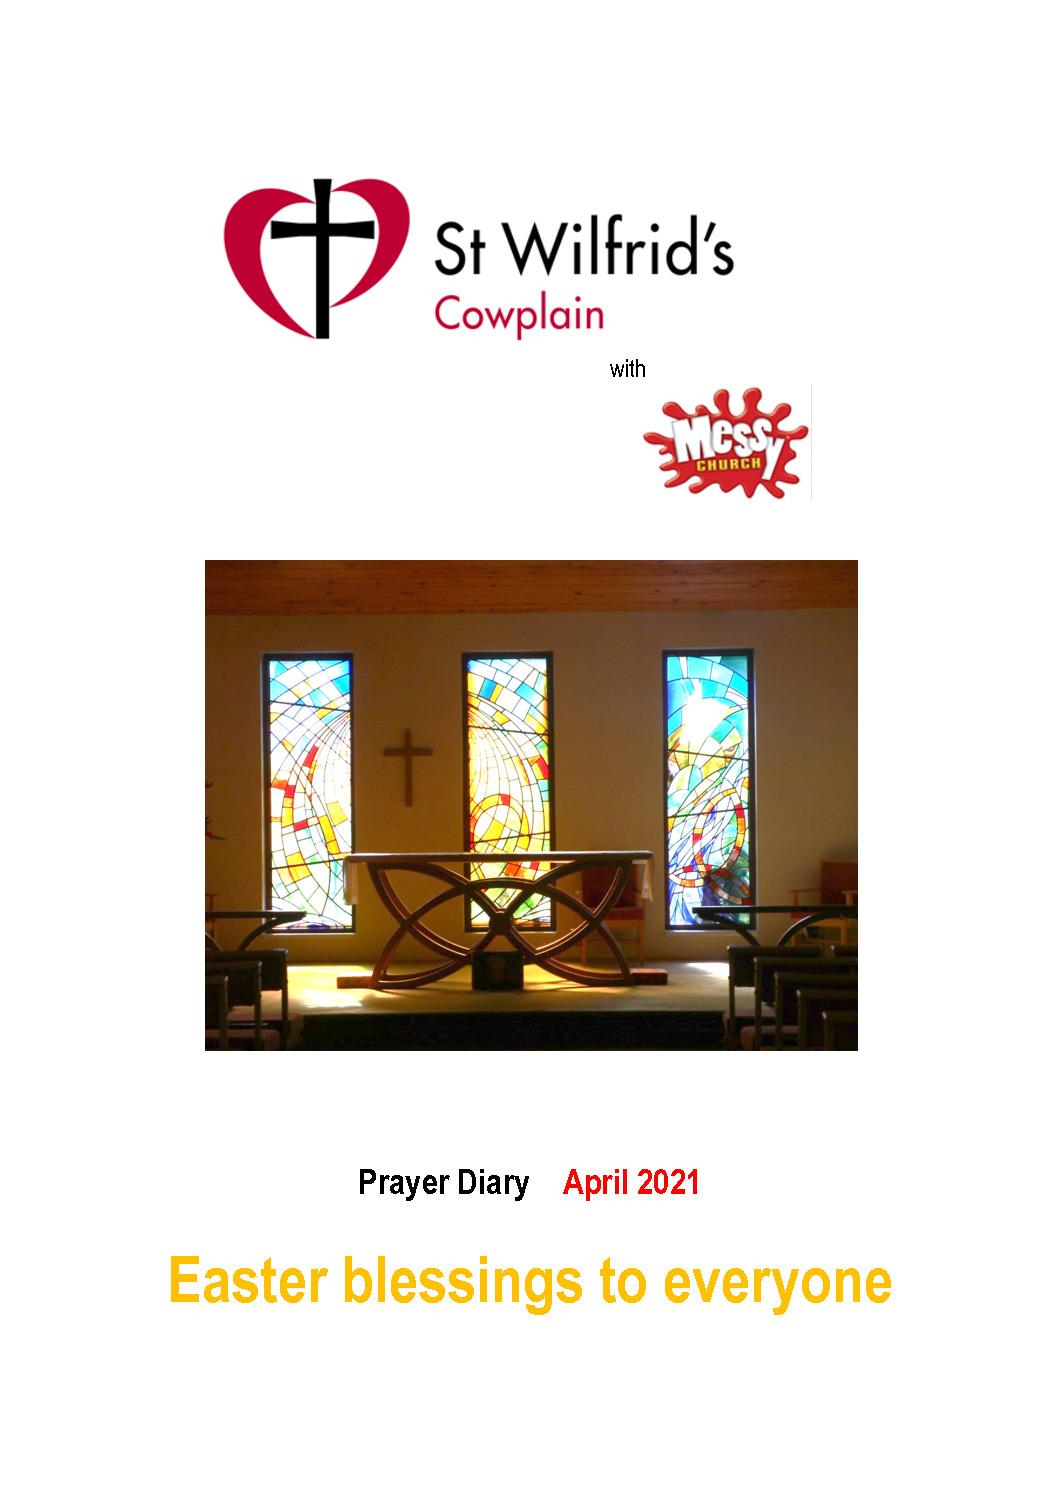 thumbnail of Prayer Diary April 2021 A4